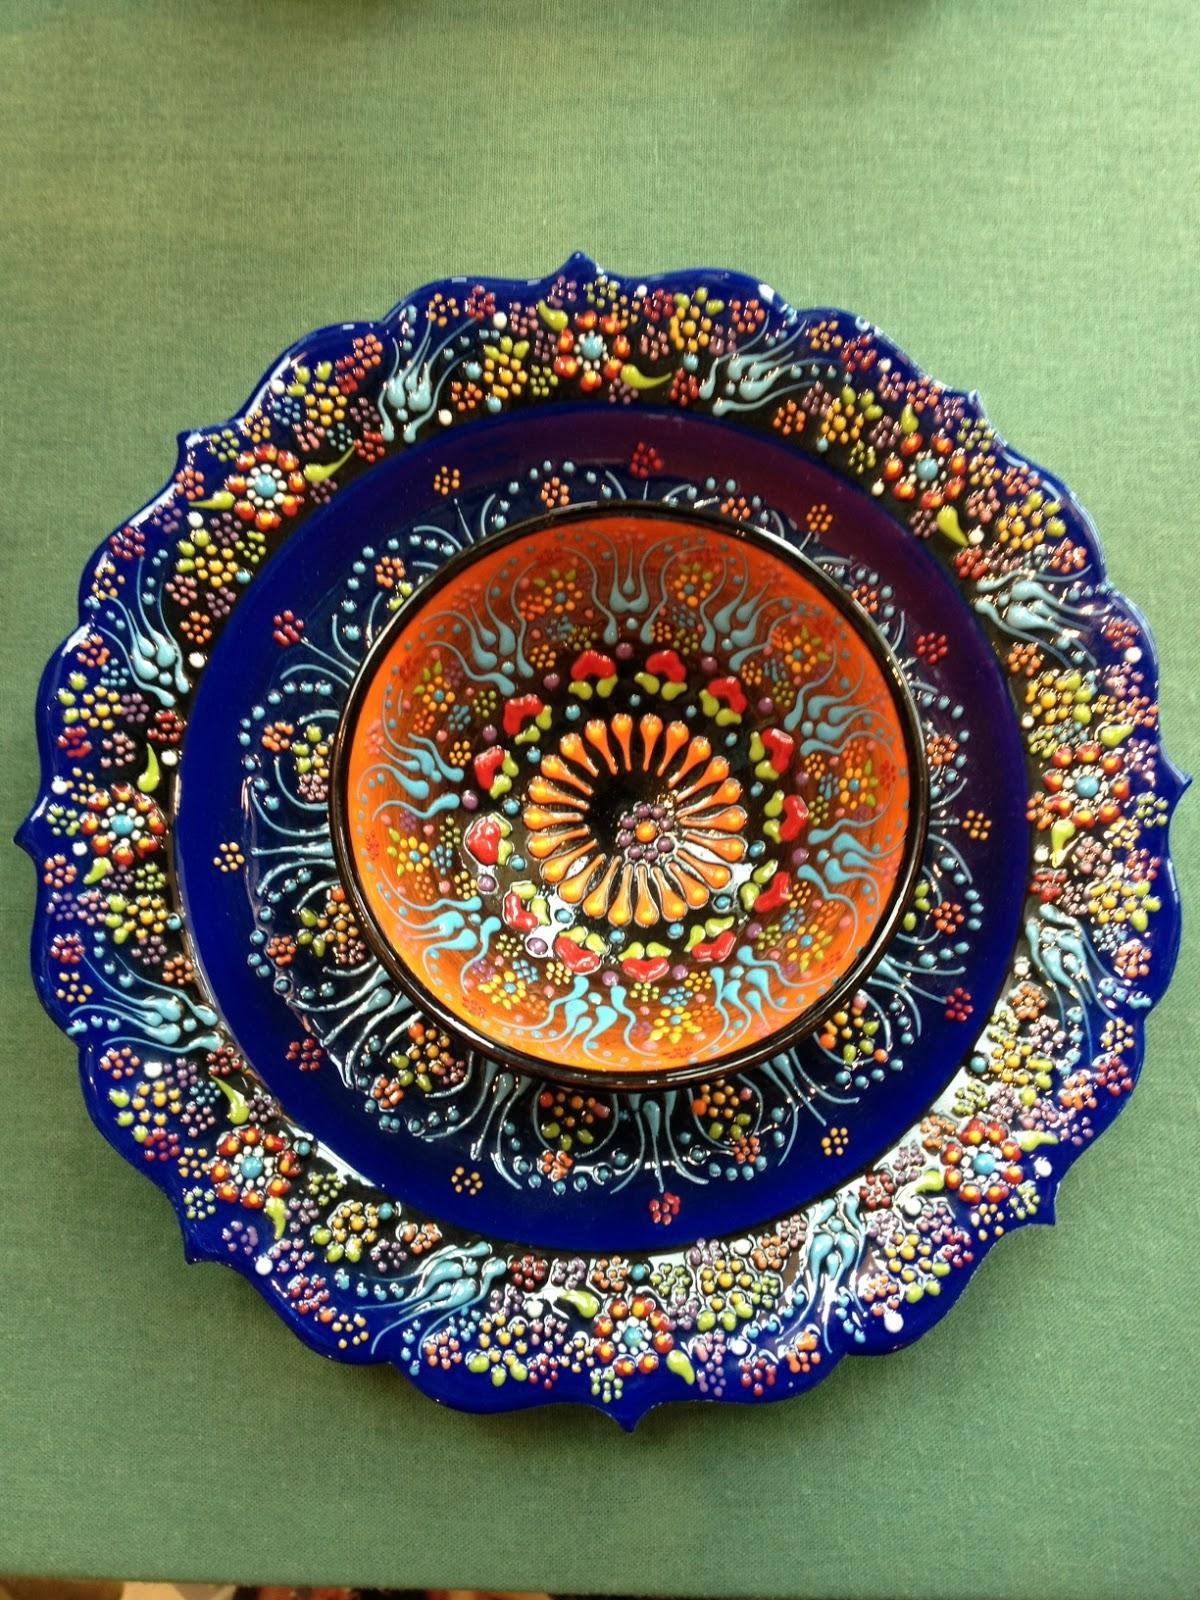 Ballard Artwalk: Iznik Ceramics Showcased at La Tienda during June